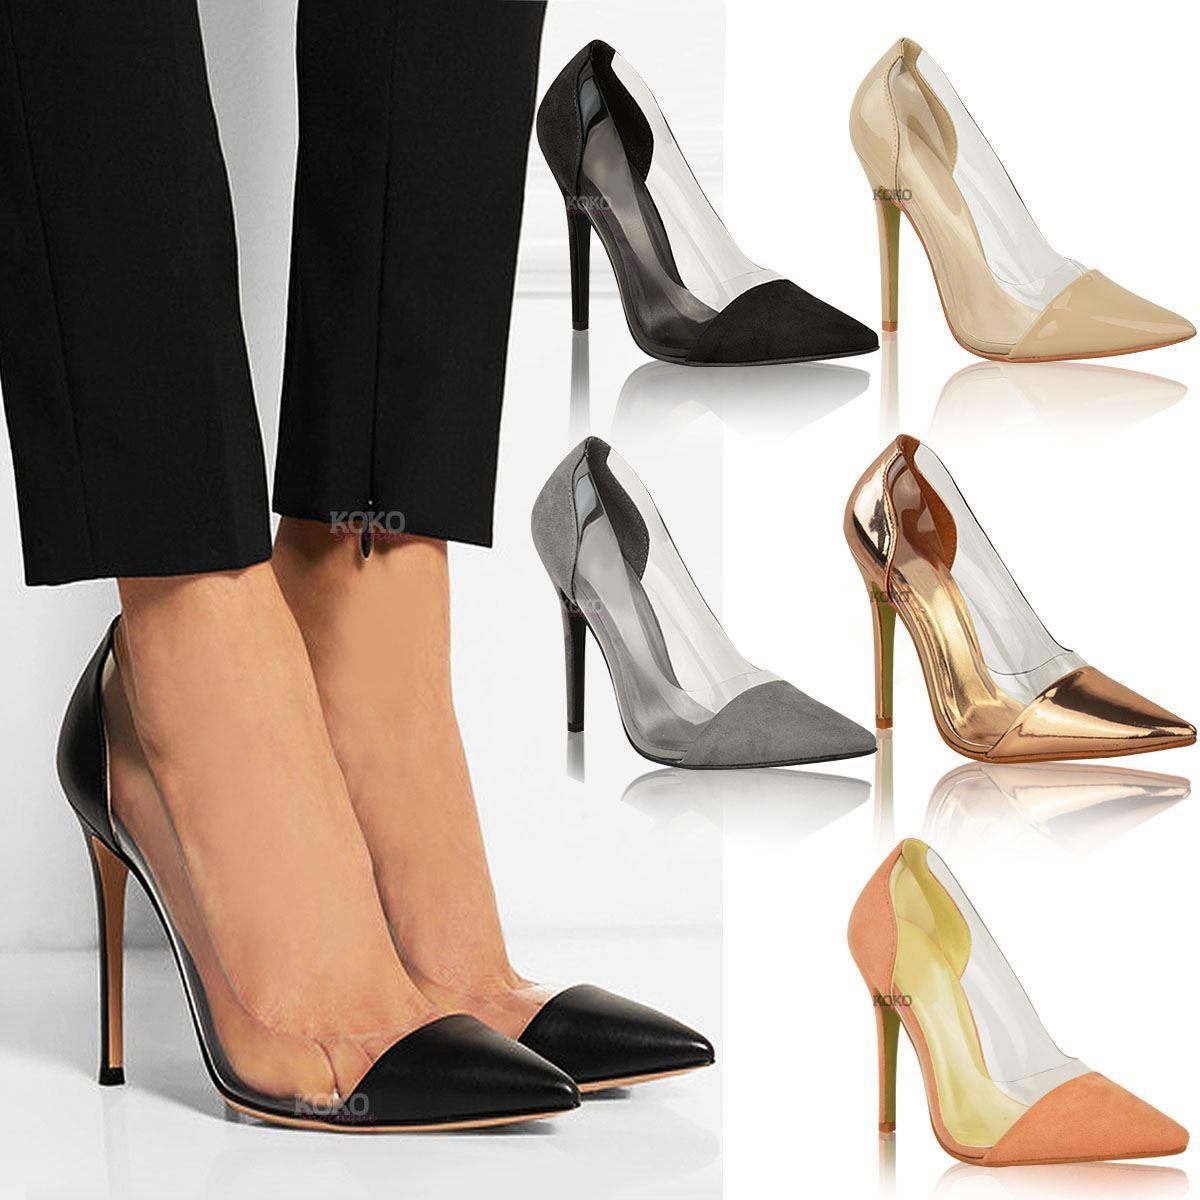 Moda jest prosta i niedroga Womens Ladies Perspex Clear Stiletto High Heel Sandals Party Slip On Courts Size